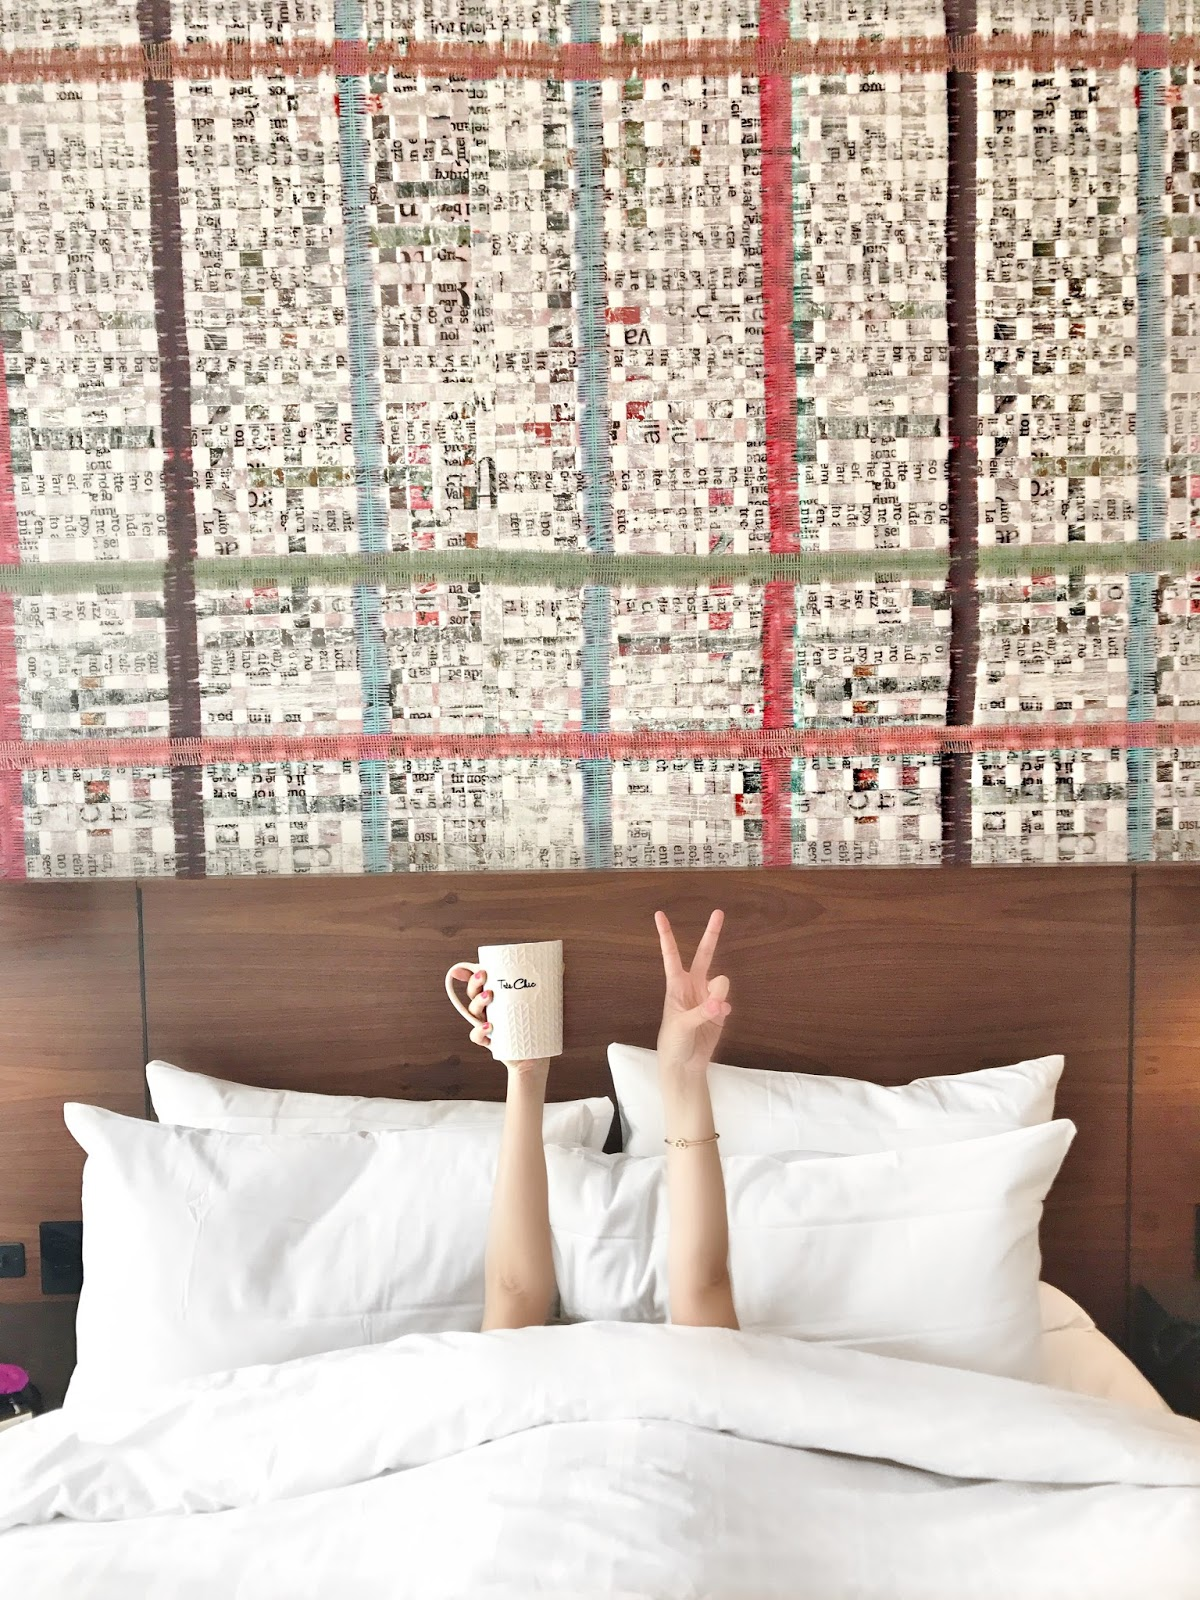 Bijuleni | Girlfriends' Mini Weekend Getaway at The Walper Hotel